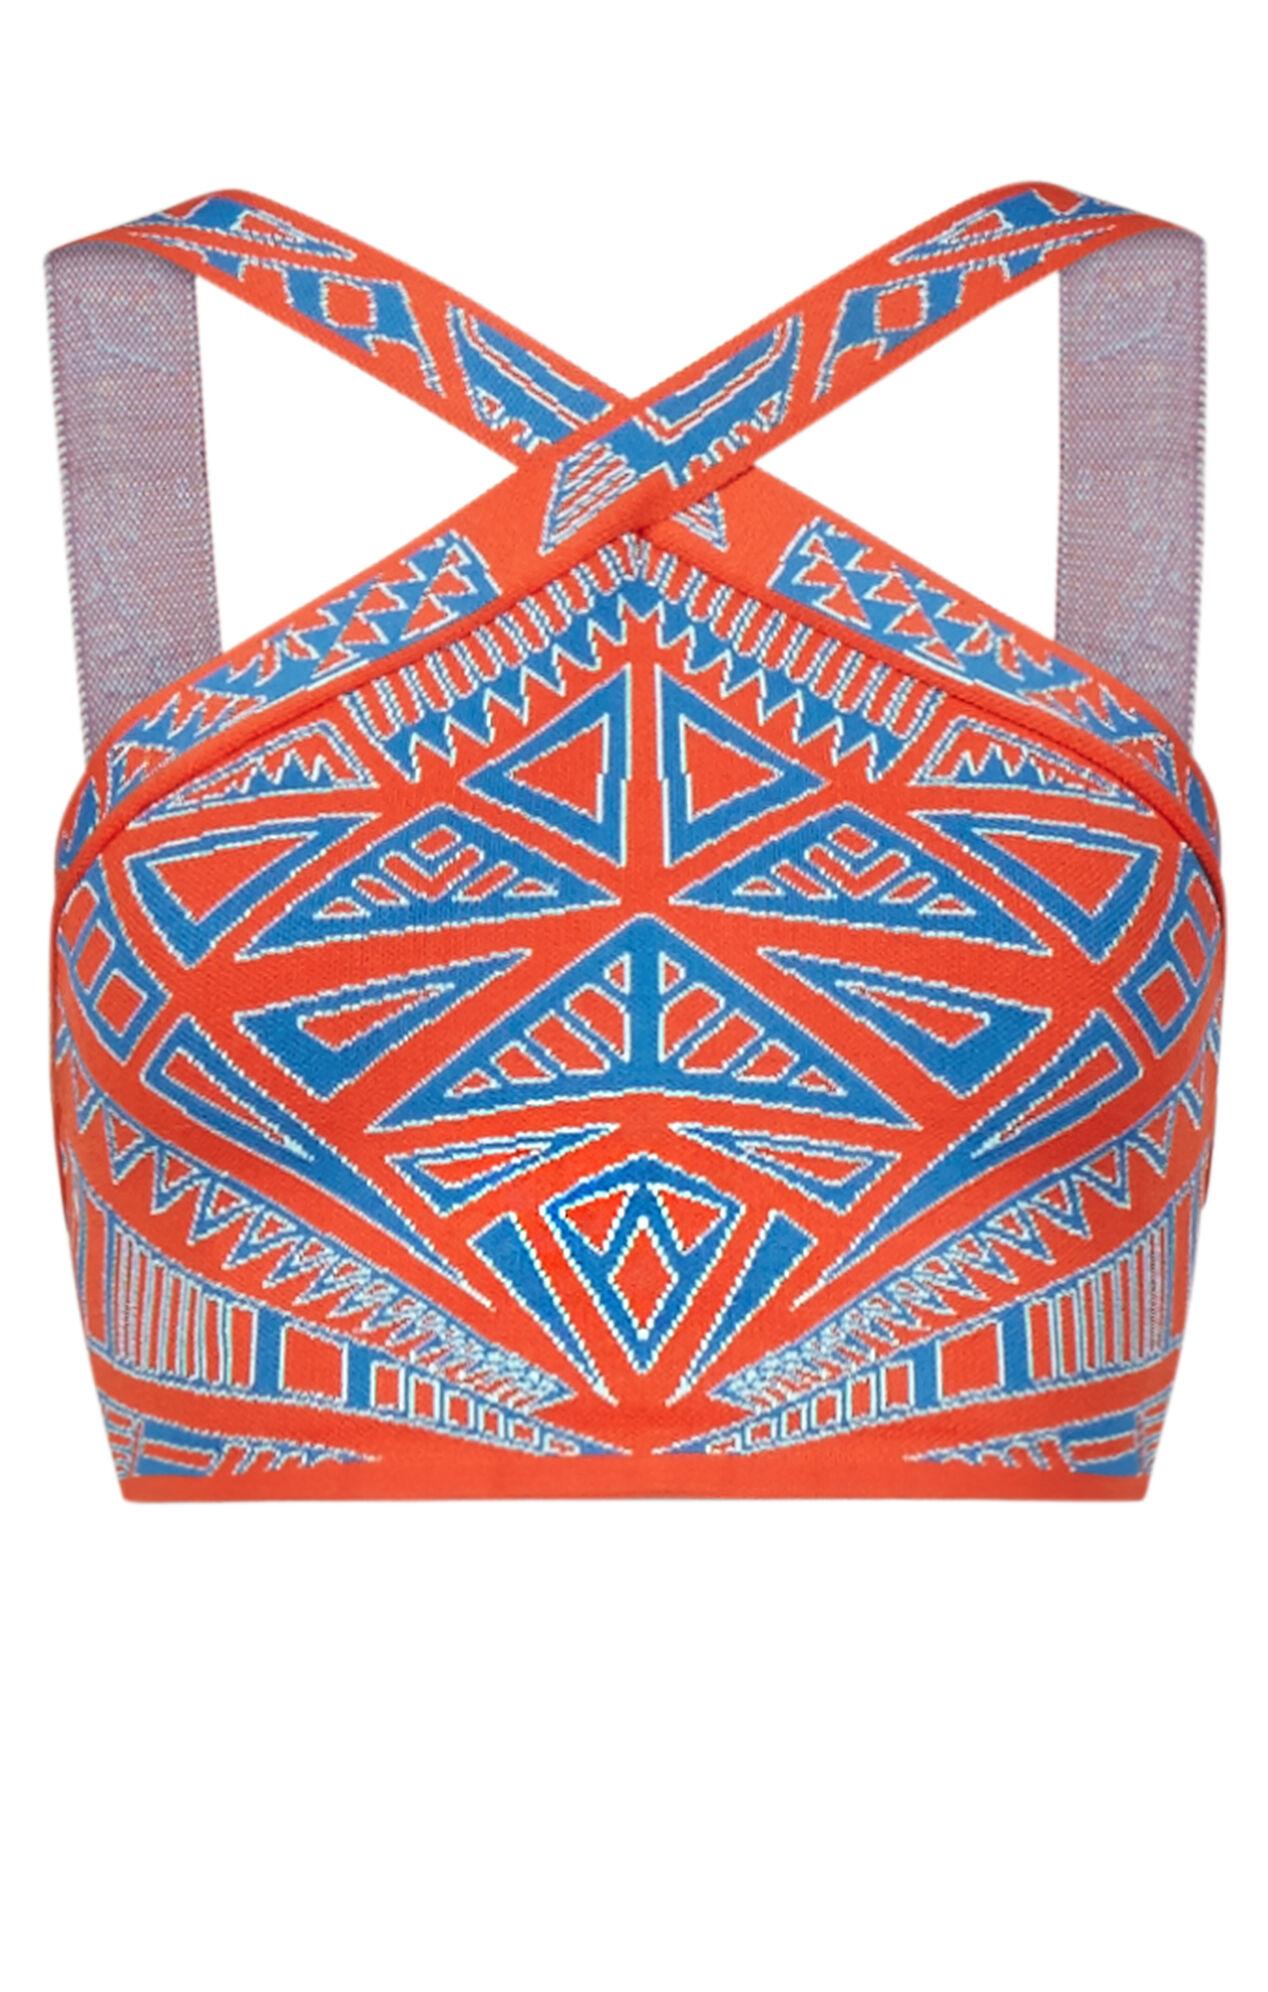 Katiya Medallion Knit Jacquard Crop Top